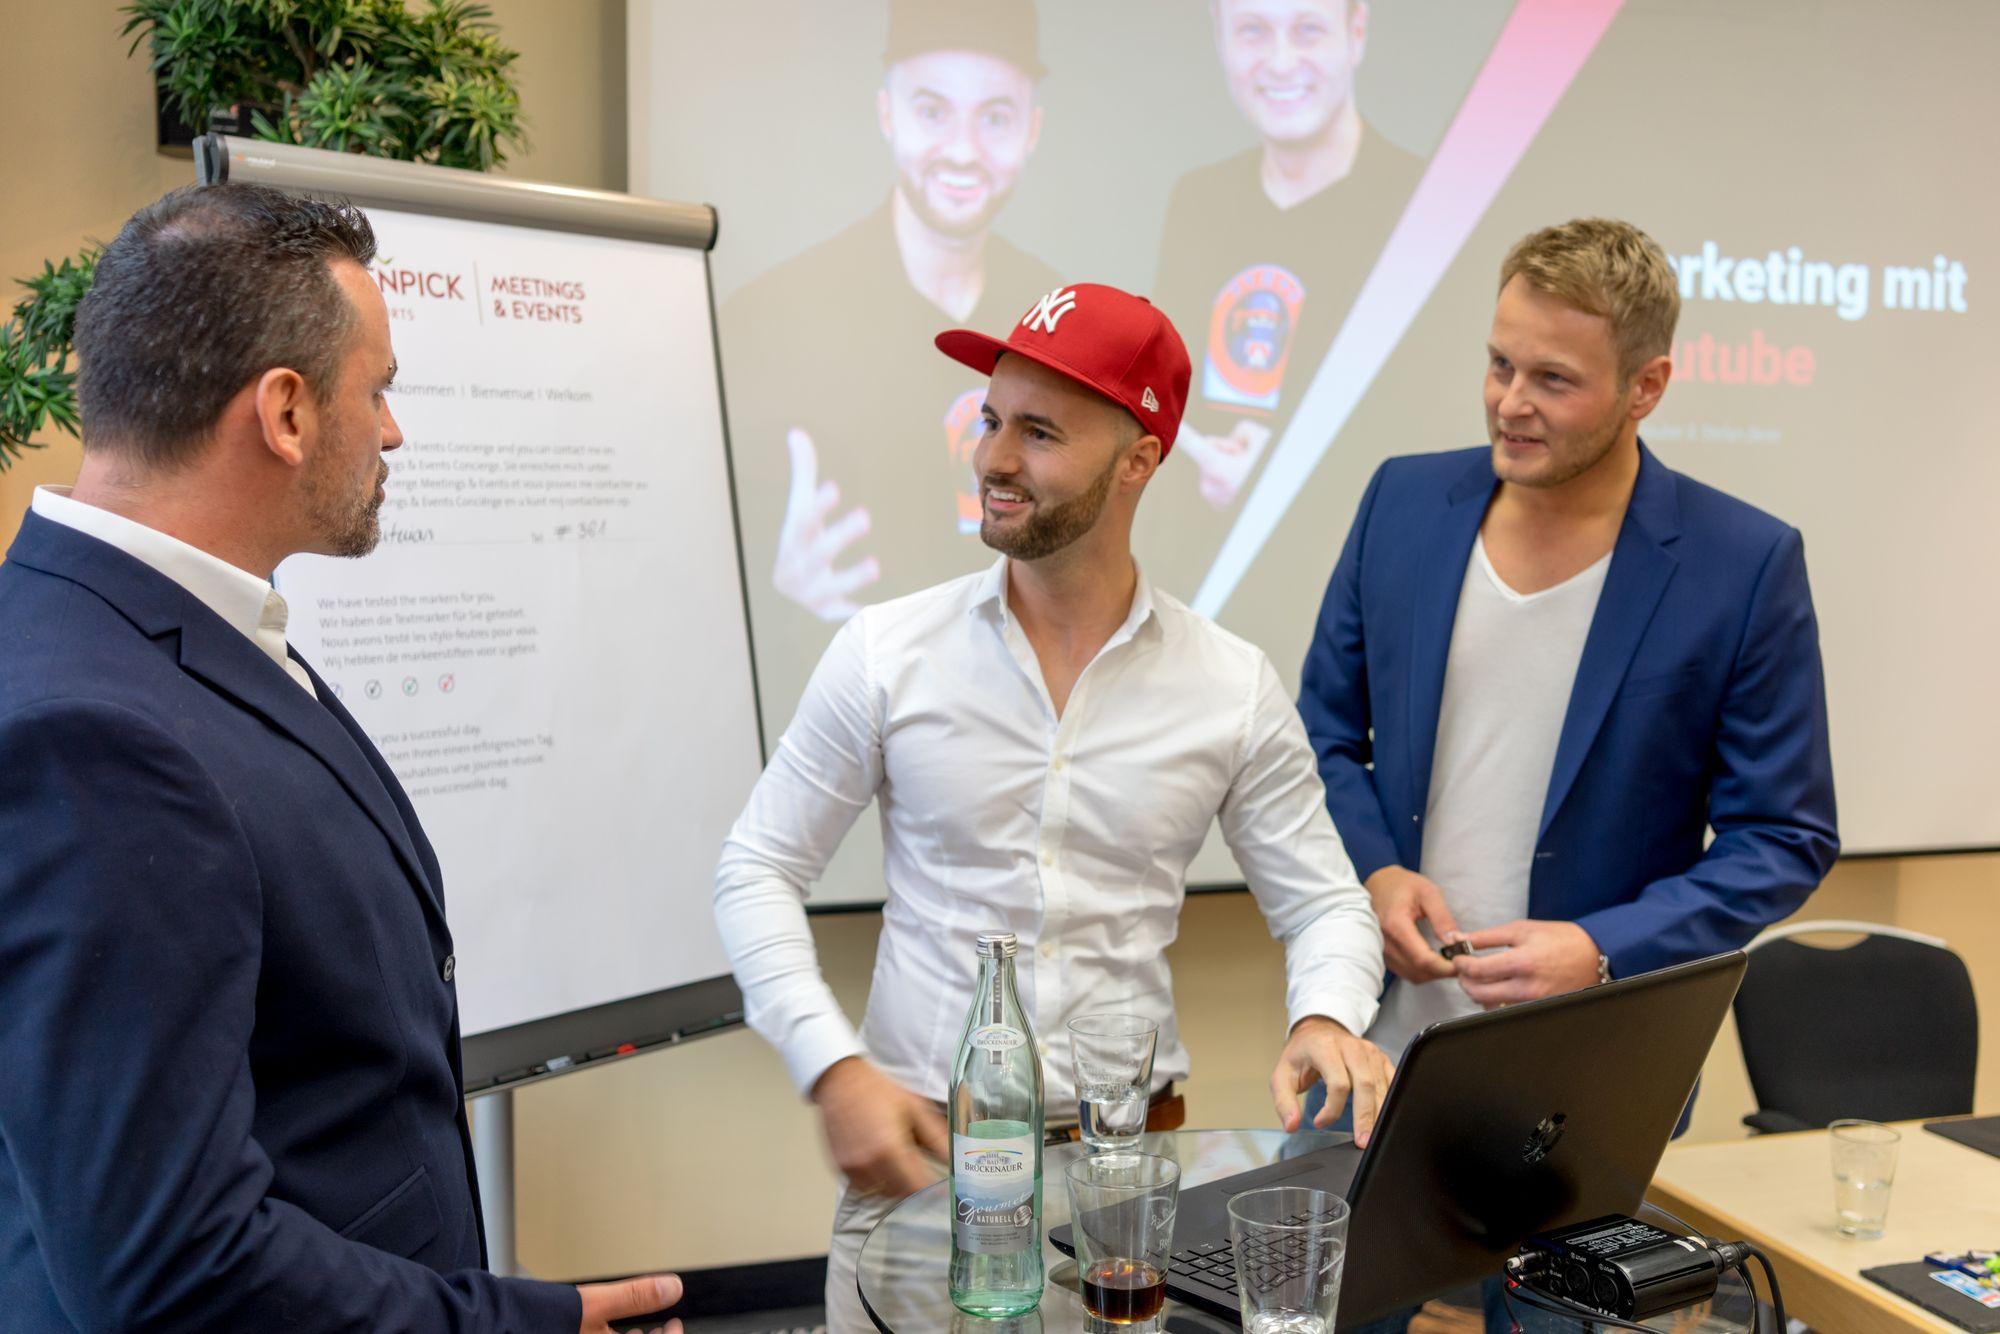 Marco Vantroba, Daniel Hauber und Stefan Beier auf dem Builderall Everest 2018 in Nürnberg (Germany)